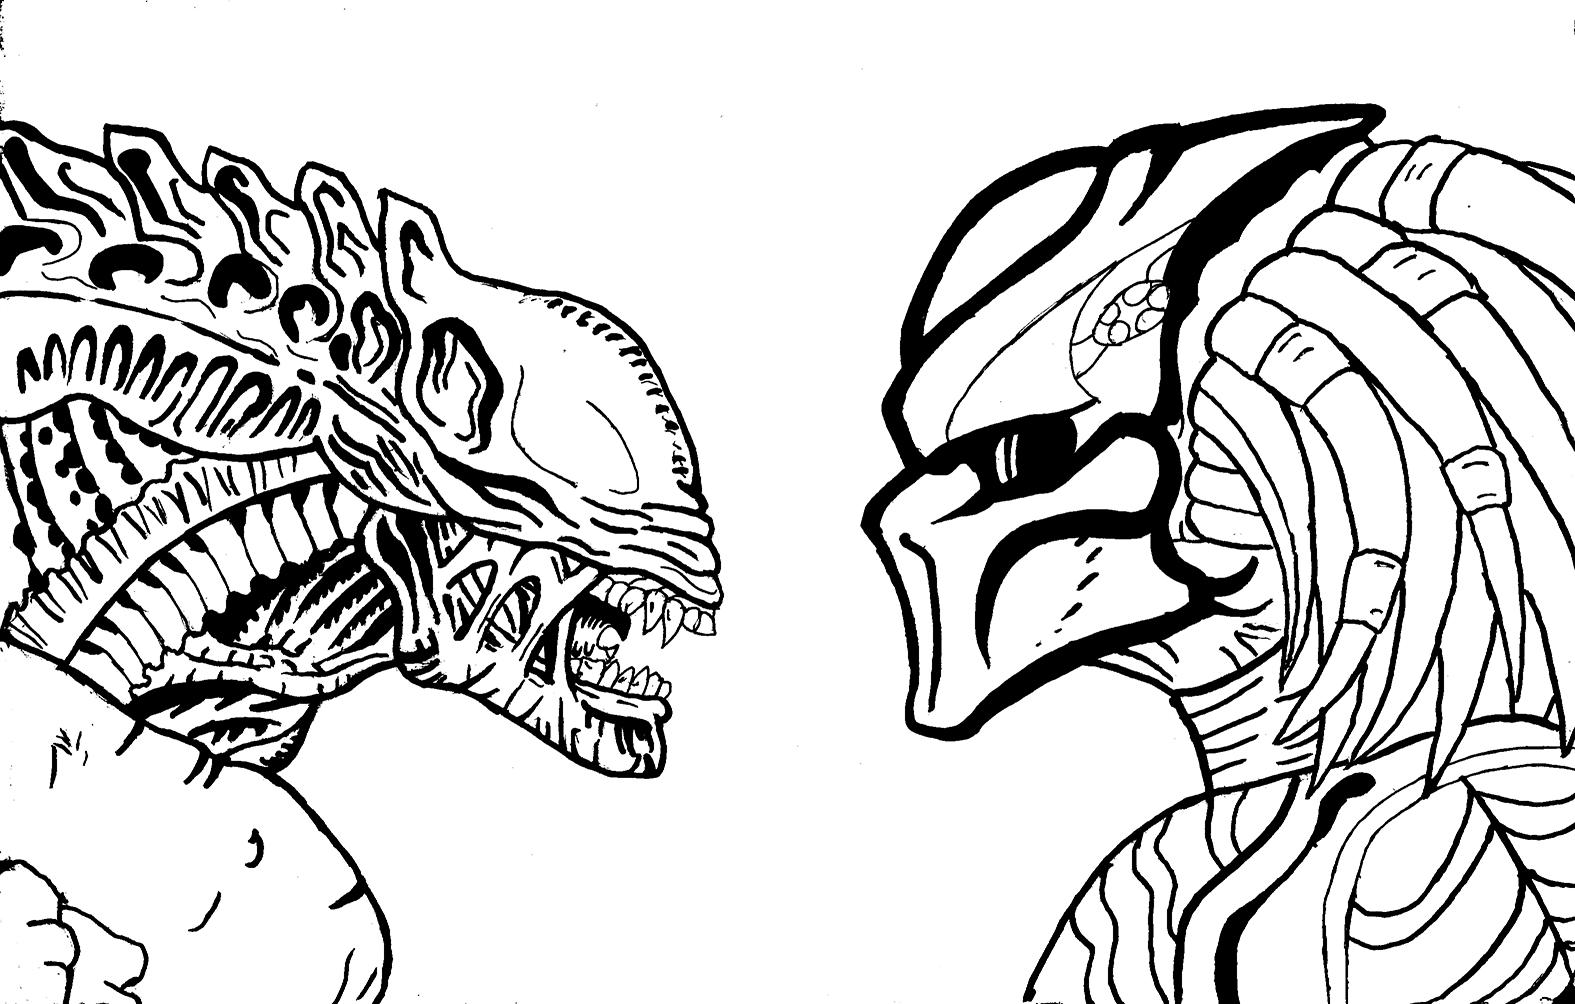 Drawn predator alien vs predator Predator Alien dragokaiju2000 Predator Alien